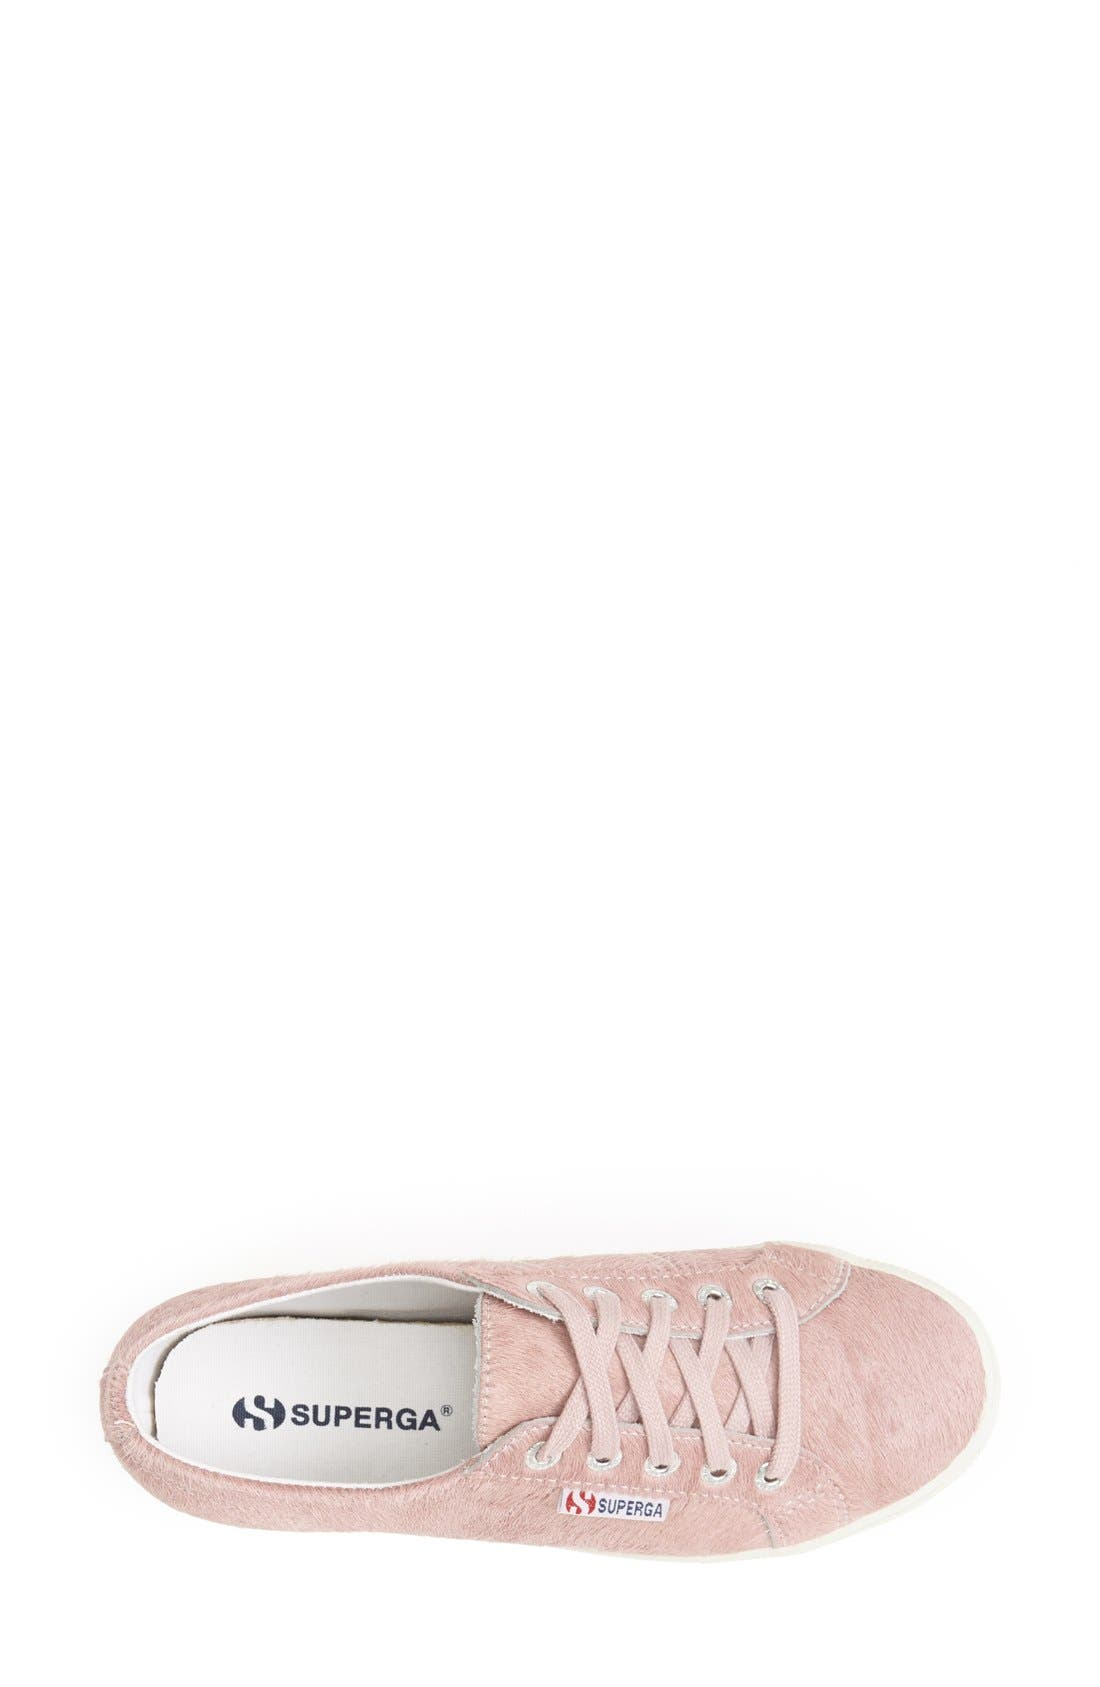 Alternate Image 3  - Superga Calf Hair Lace Up Sneaker (Women)